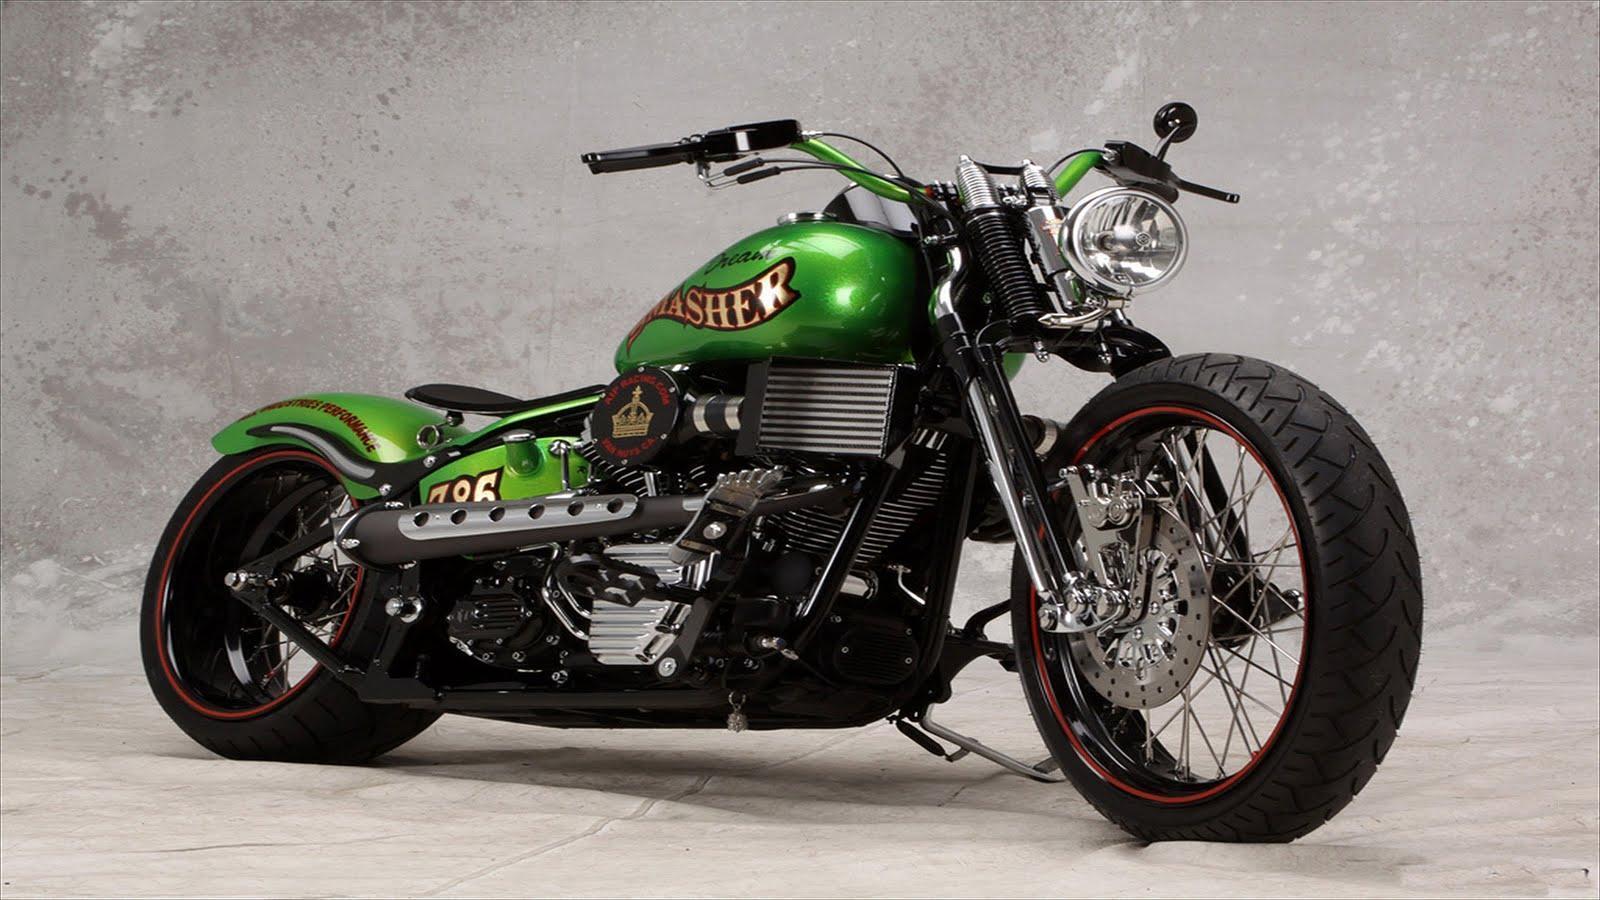 Motor Sports Hd Wallpaper: Motorcycle HD Wallpapers